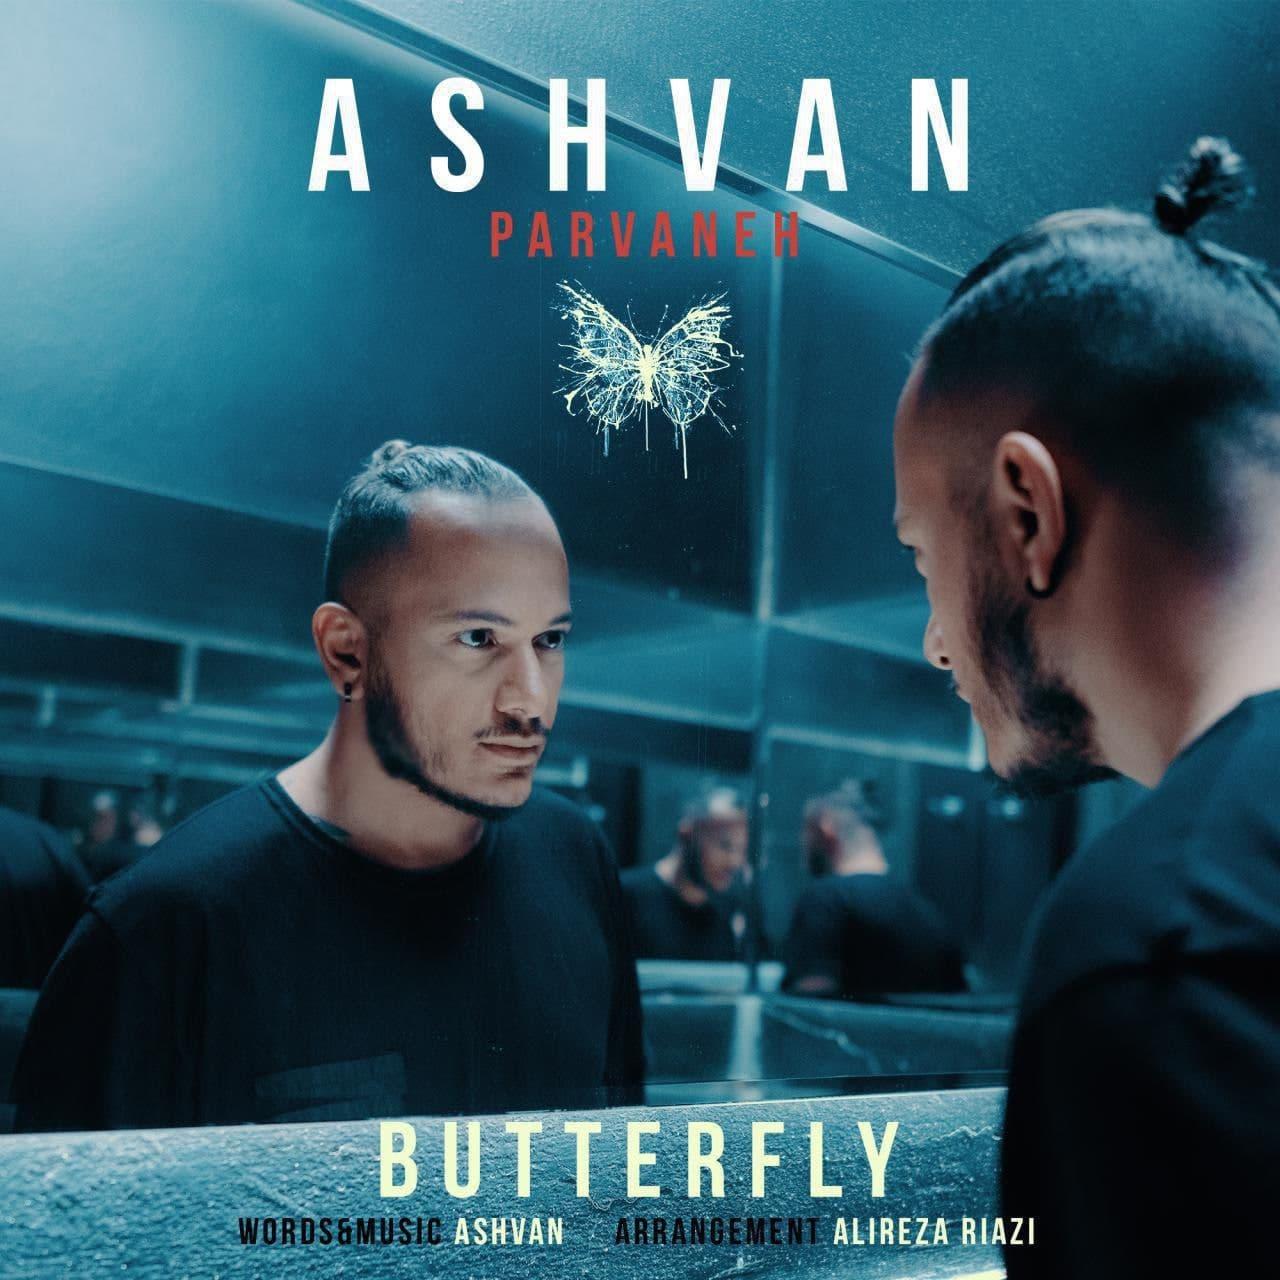 Ashvan – Parvaneh